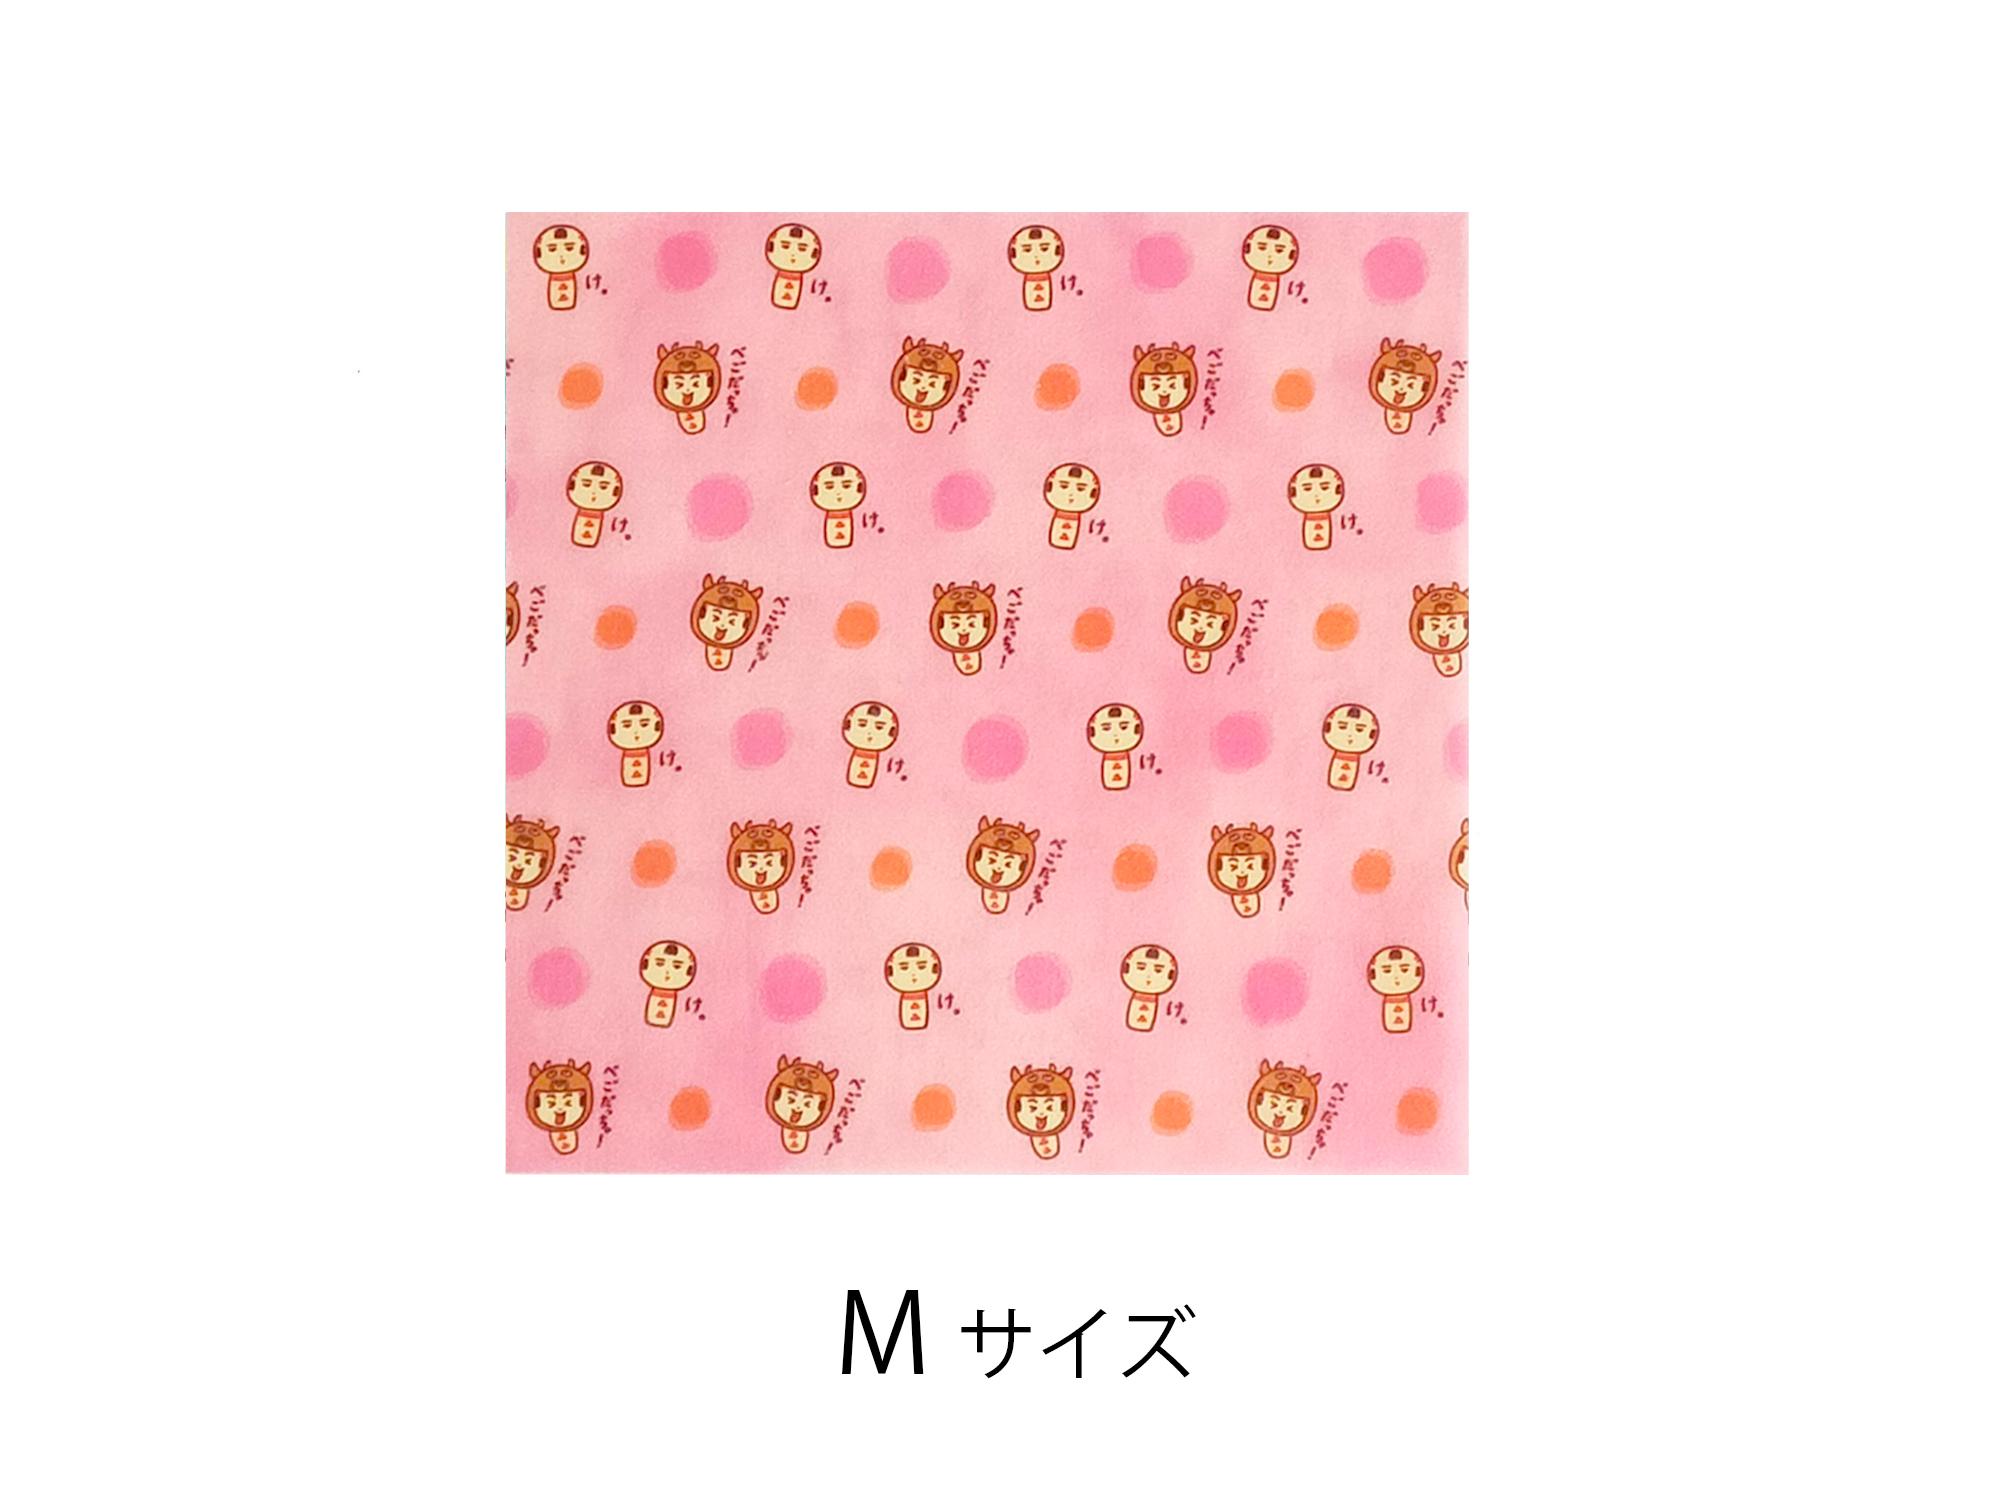 tsu tsu mi / M 27cm / 仙台弁こけし 牛タン